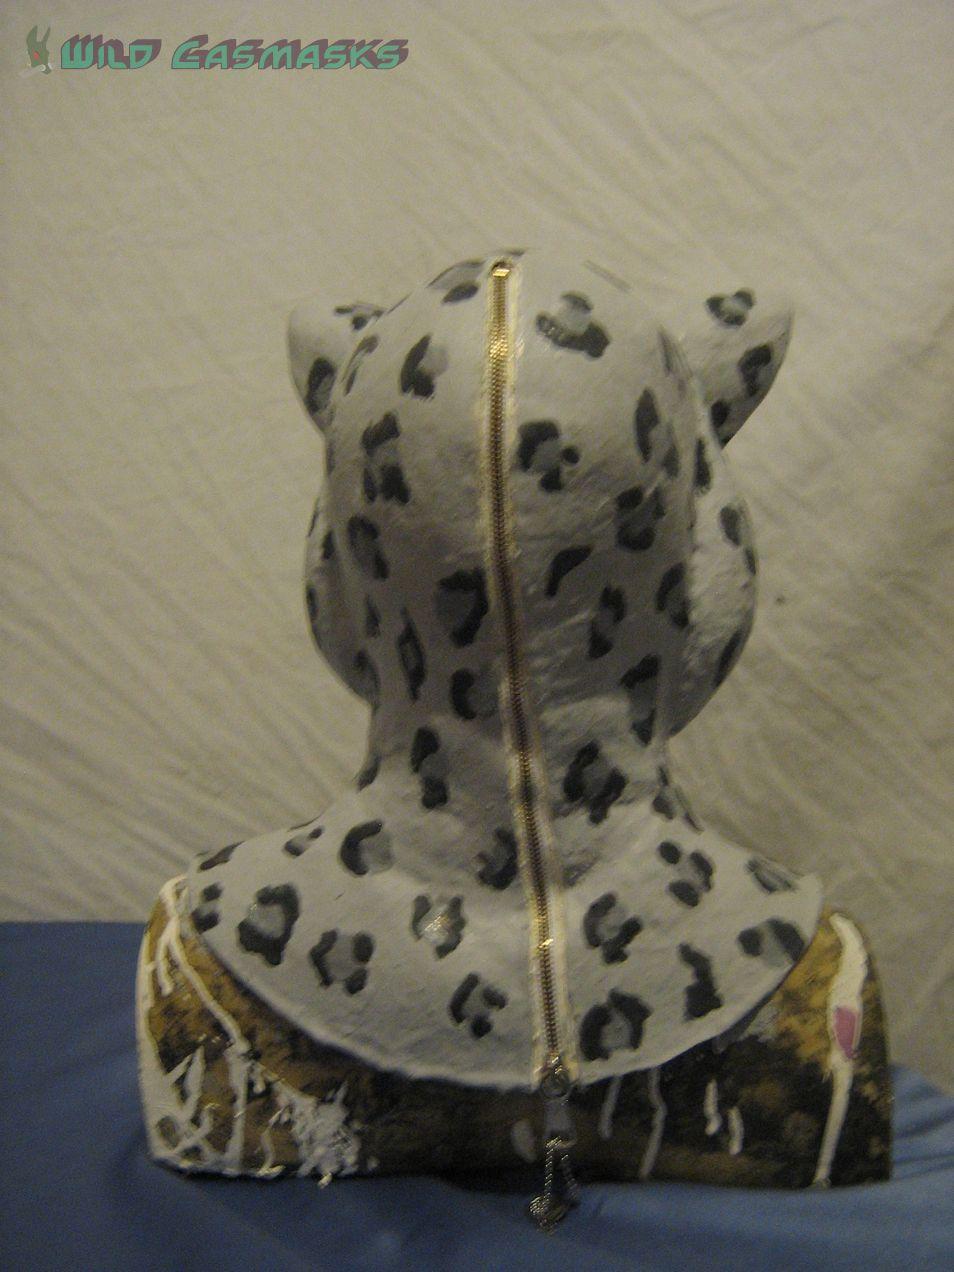 Snow Leopard 2 - Back View